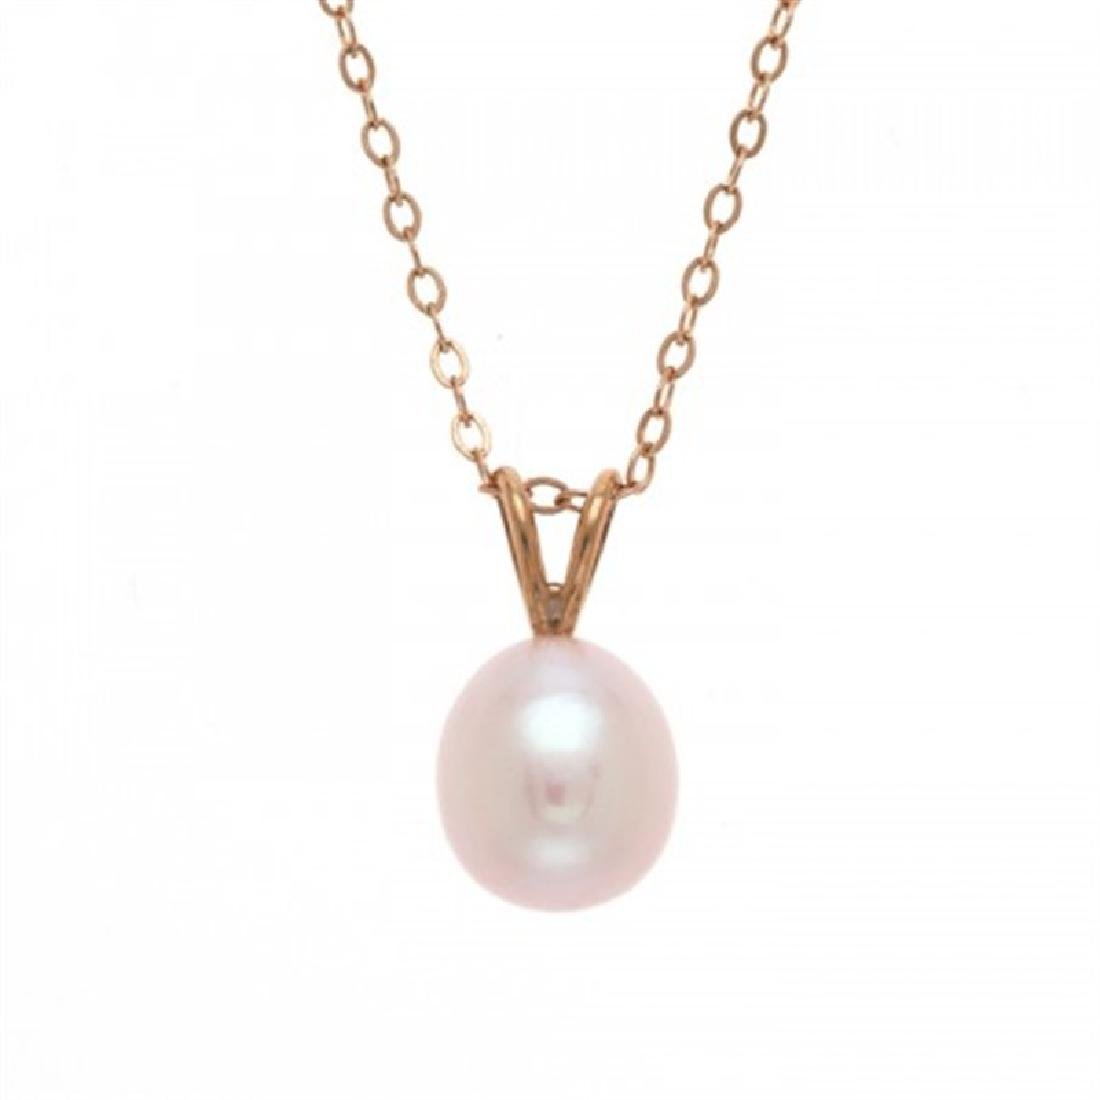 8.0-8.5mm Freshwater Pearl Pendant